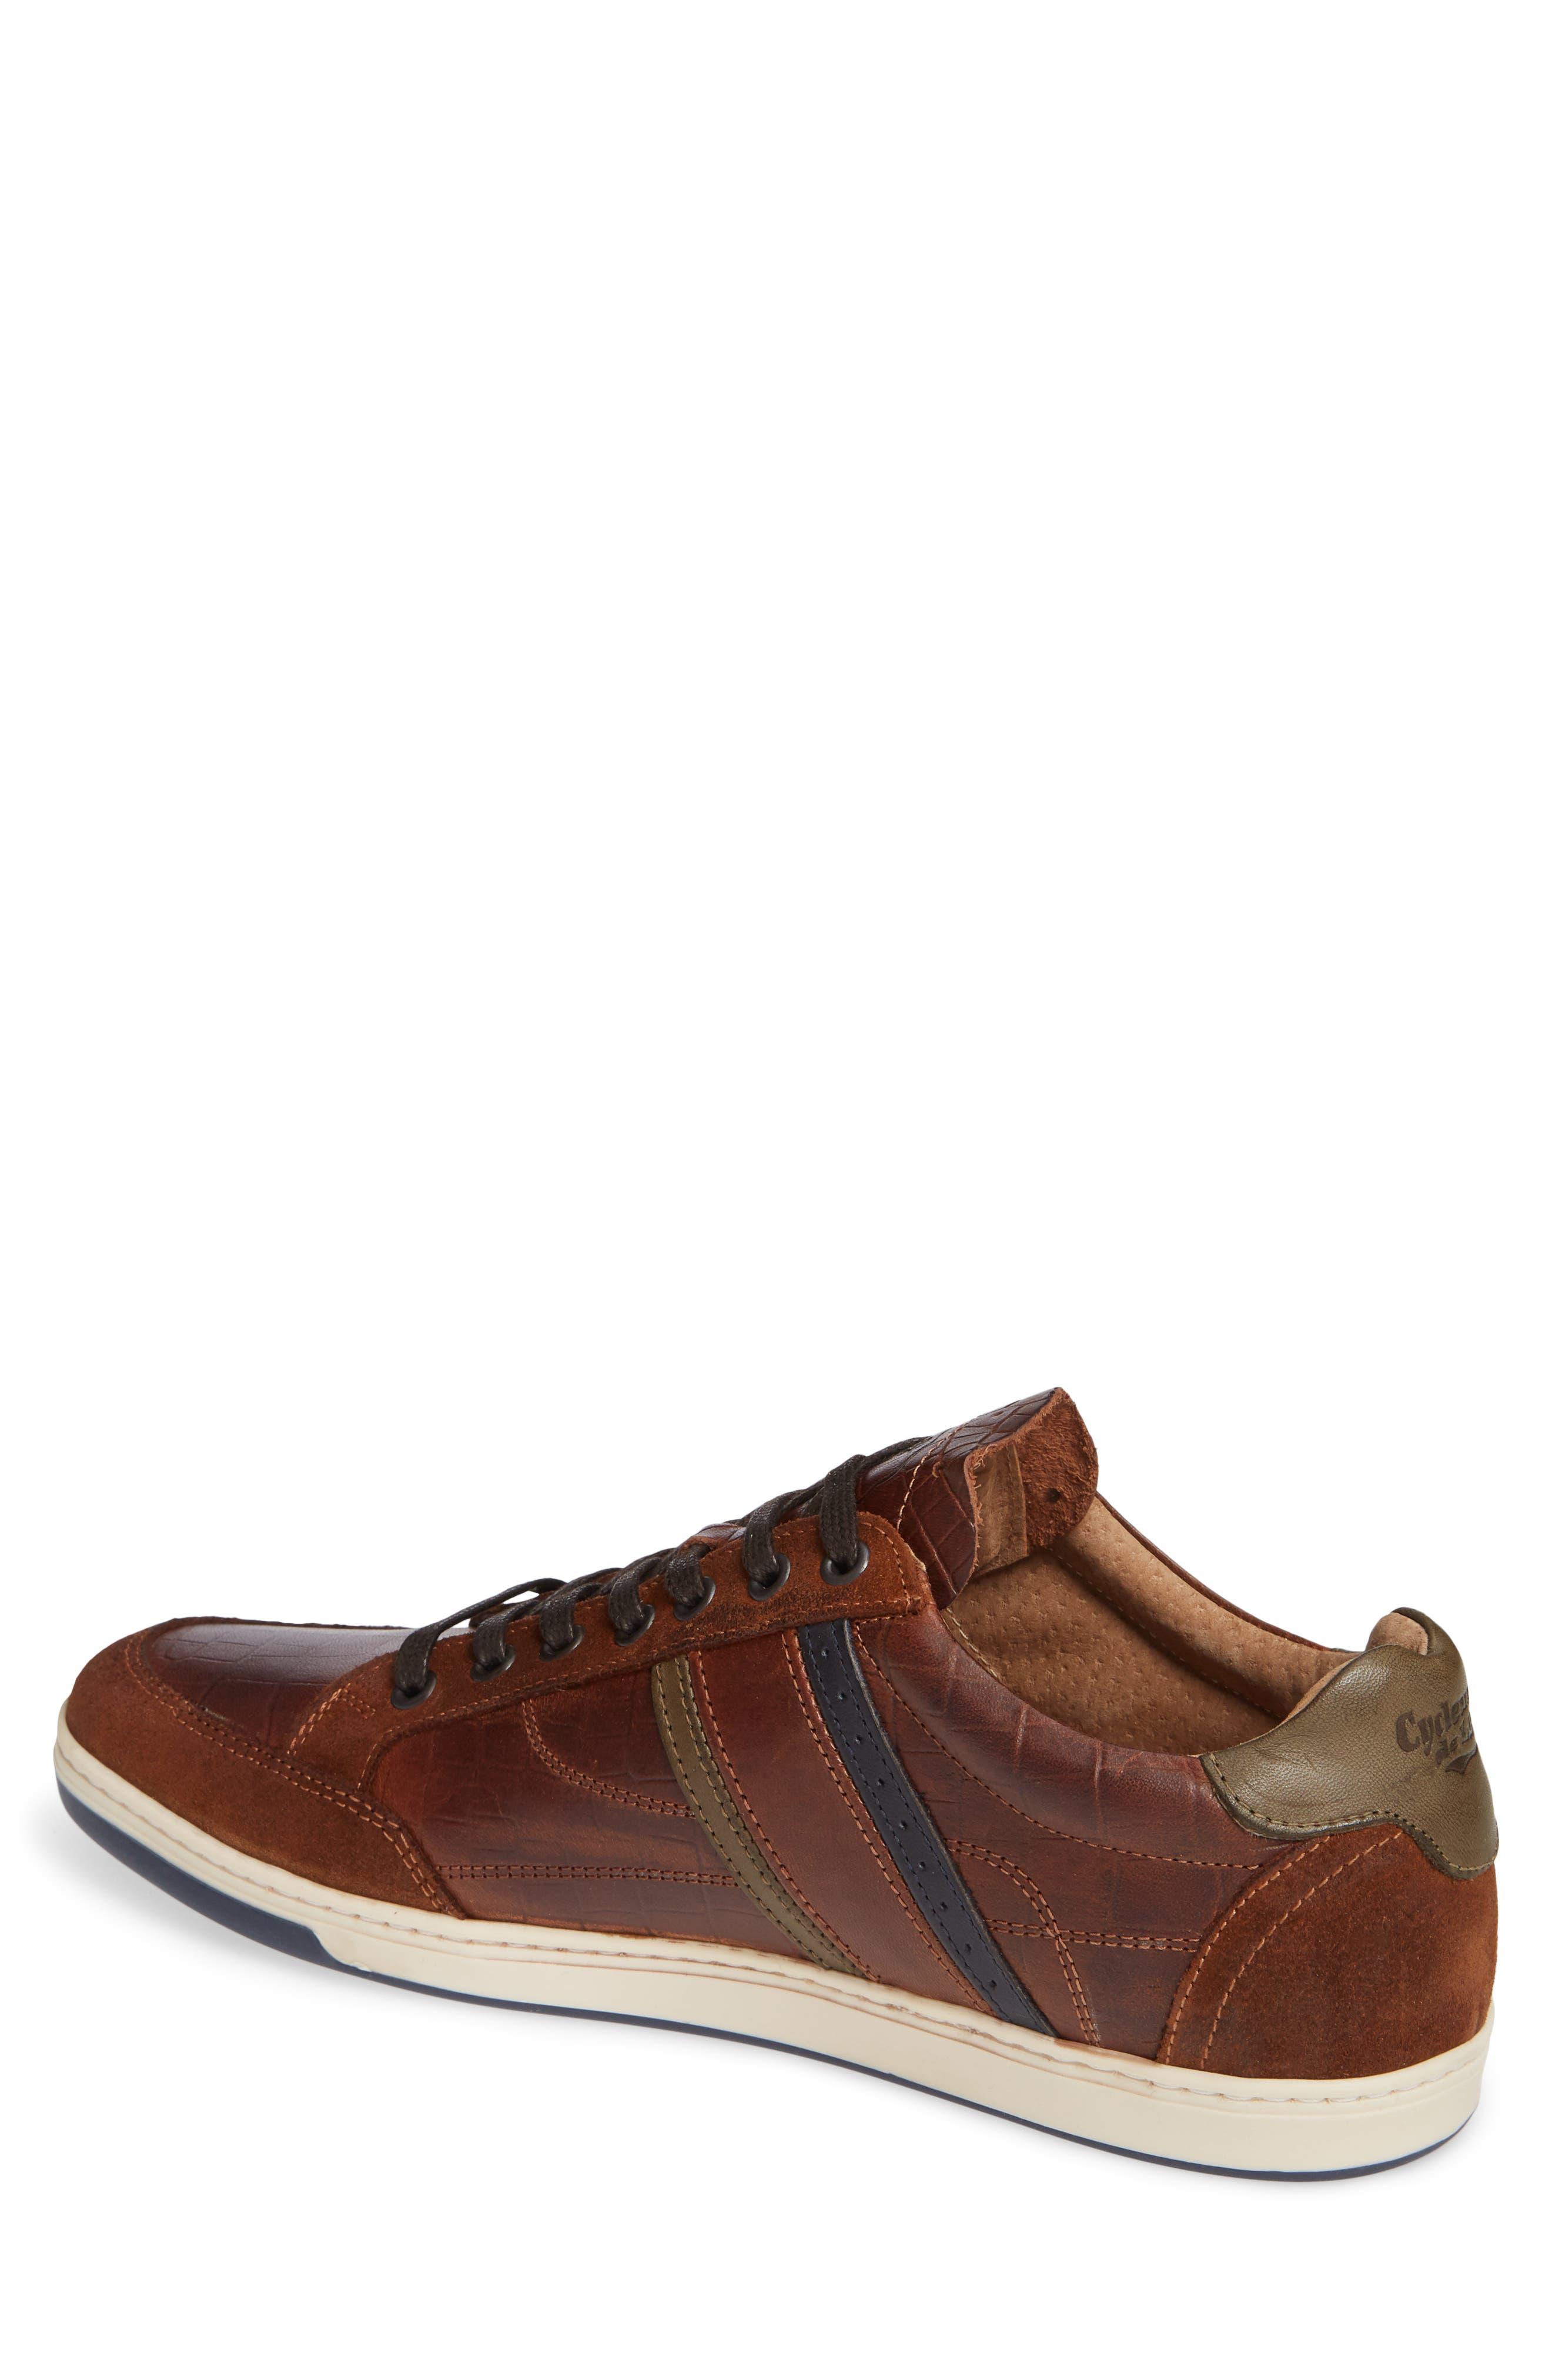 Preston Sneaker,                             Alternate thumbnail 2, color,                             COGNAC